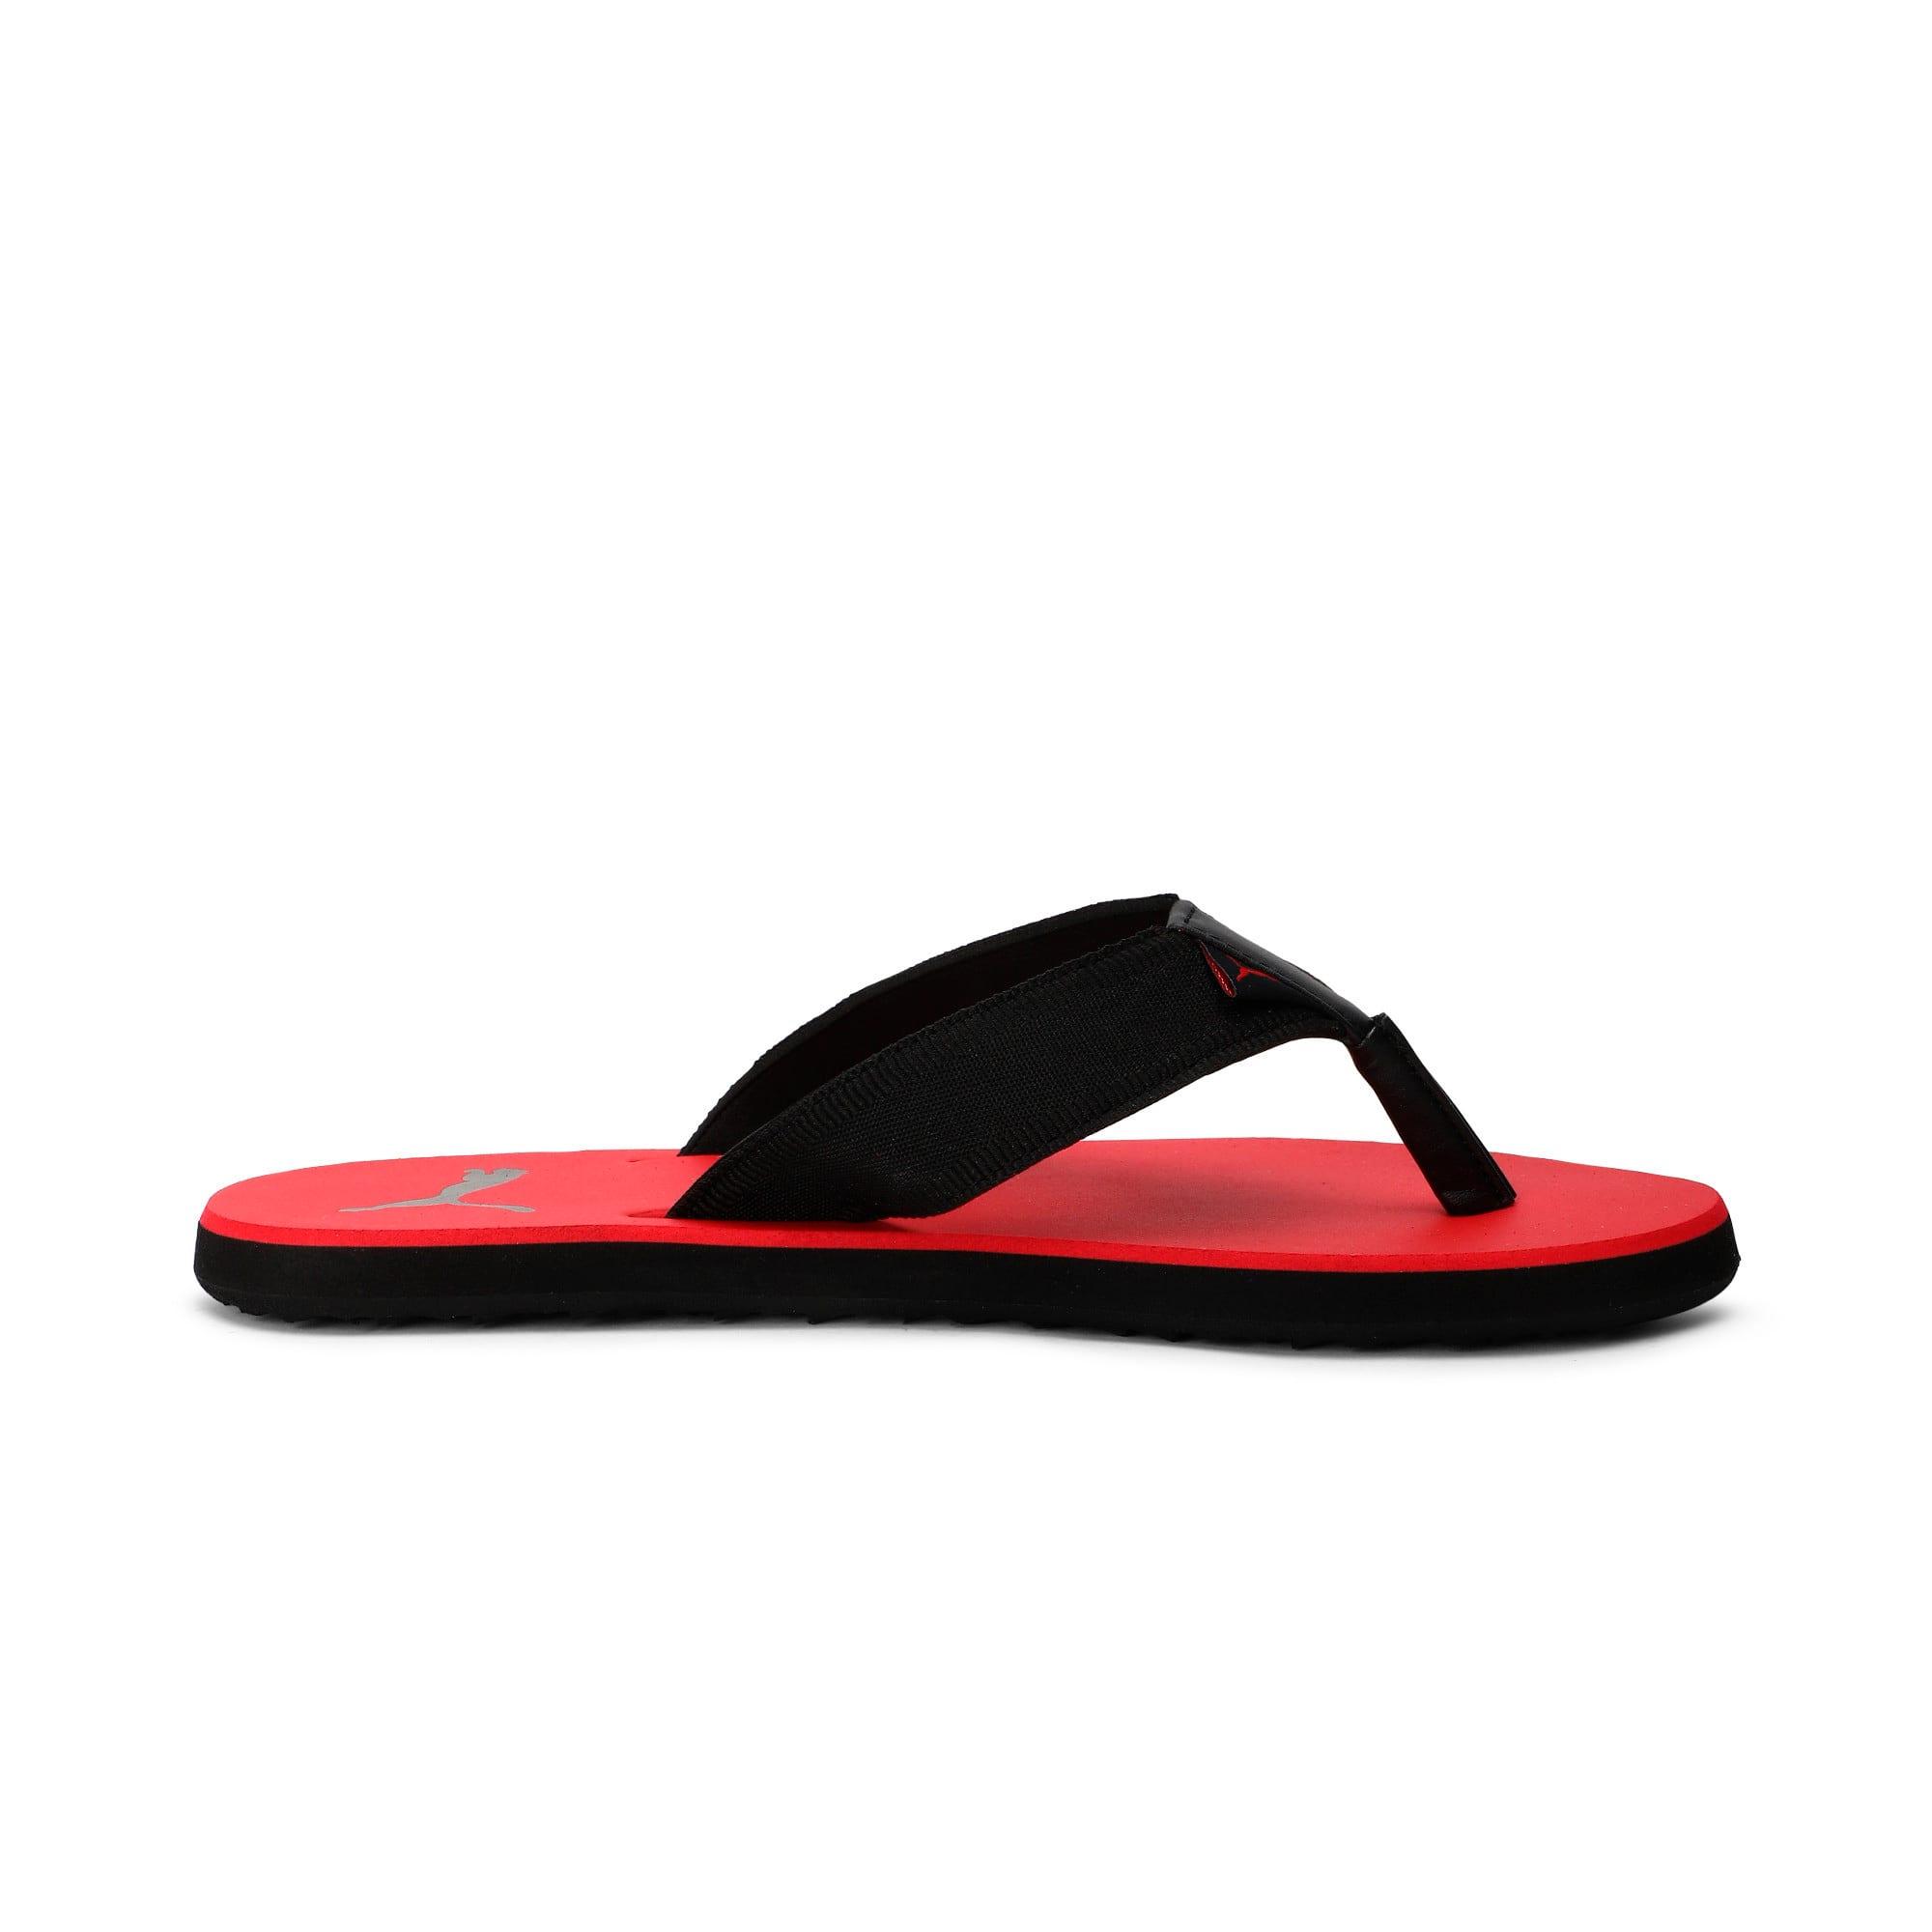 Thumbnail 5 of Breeze one8 GU Men's Sandals, High Risk Red-Puma Black, medium-IND